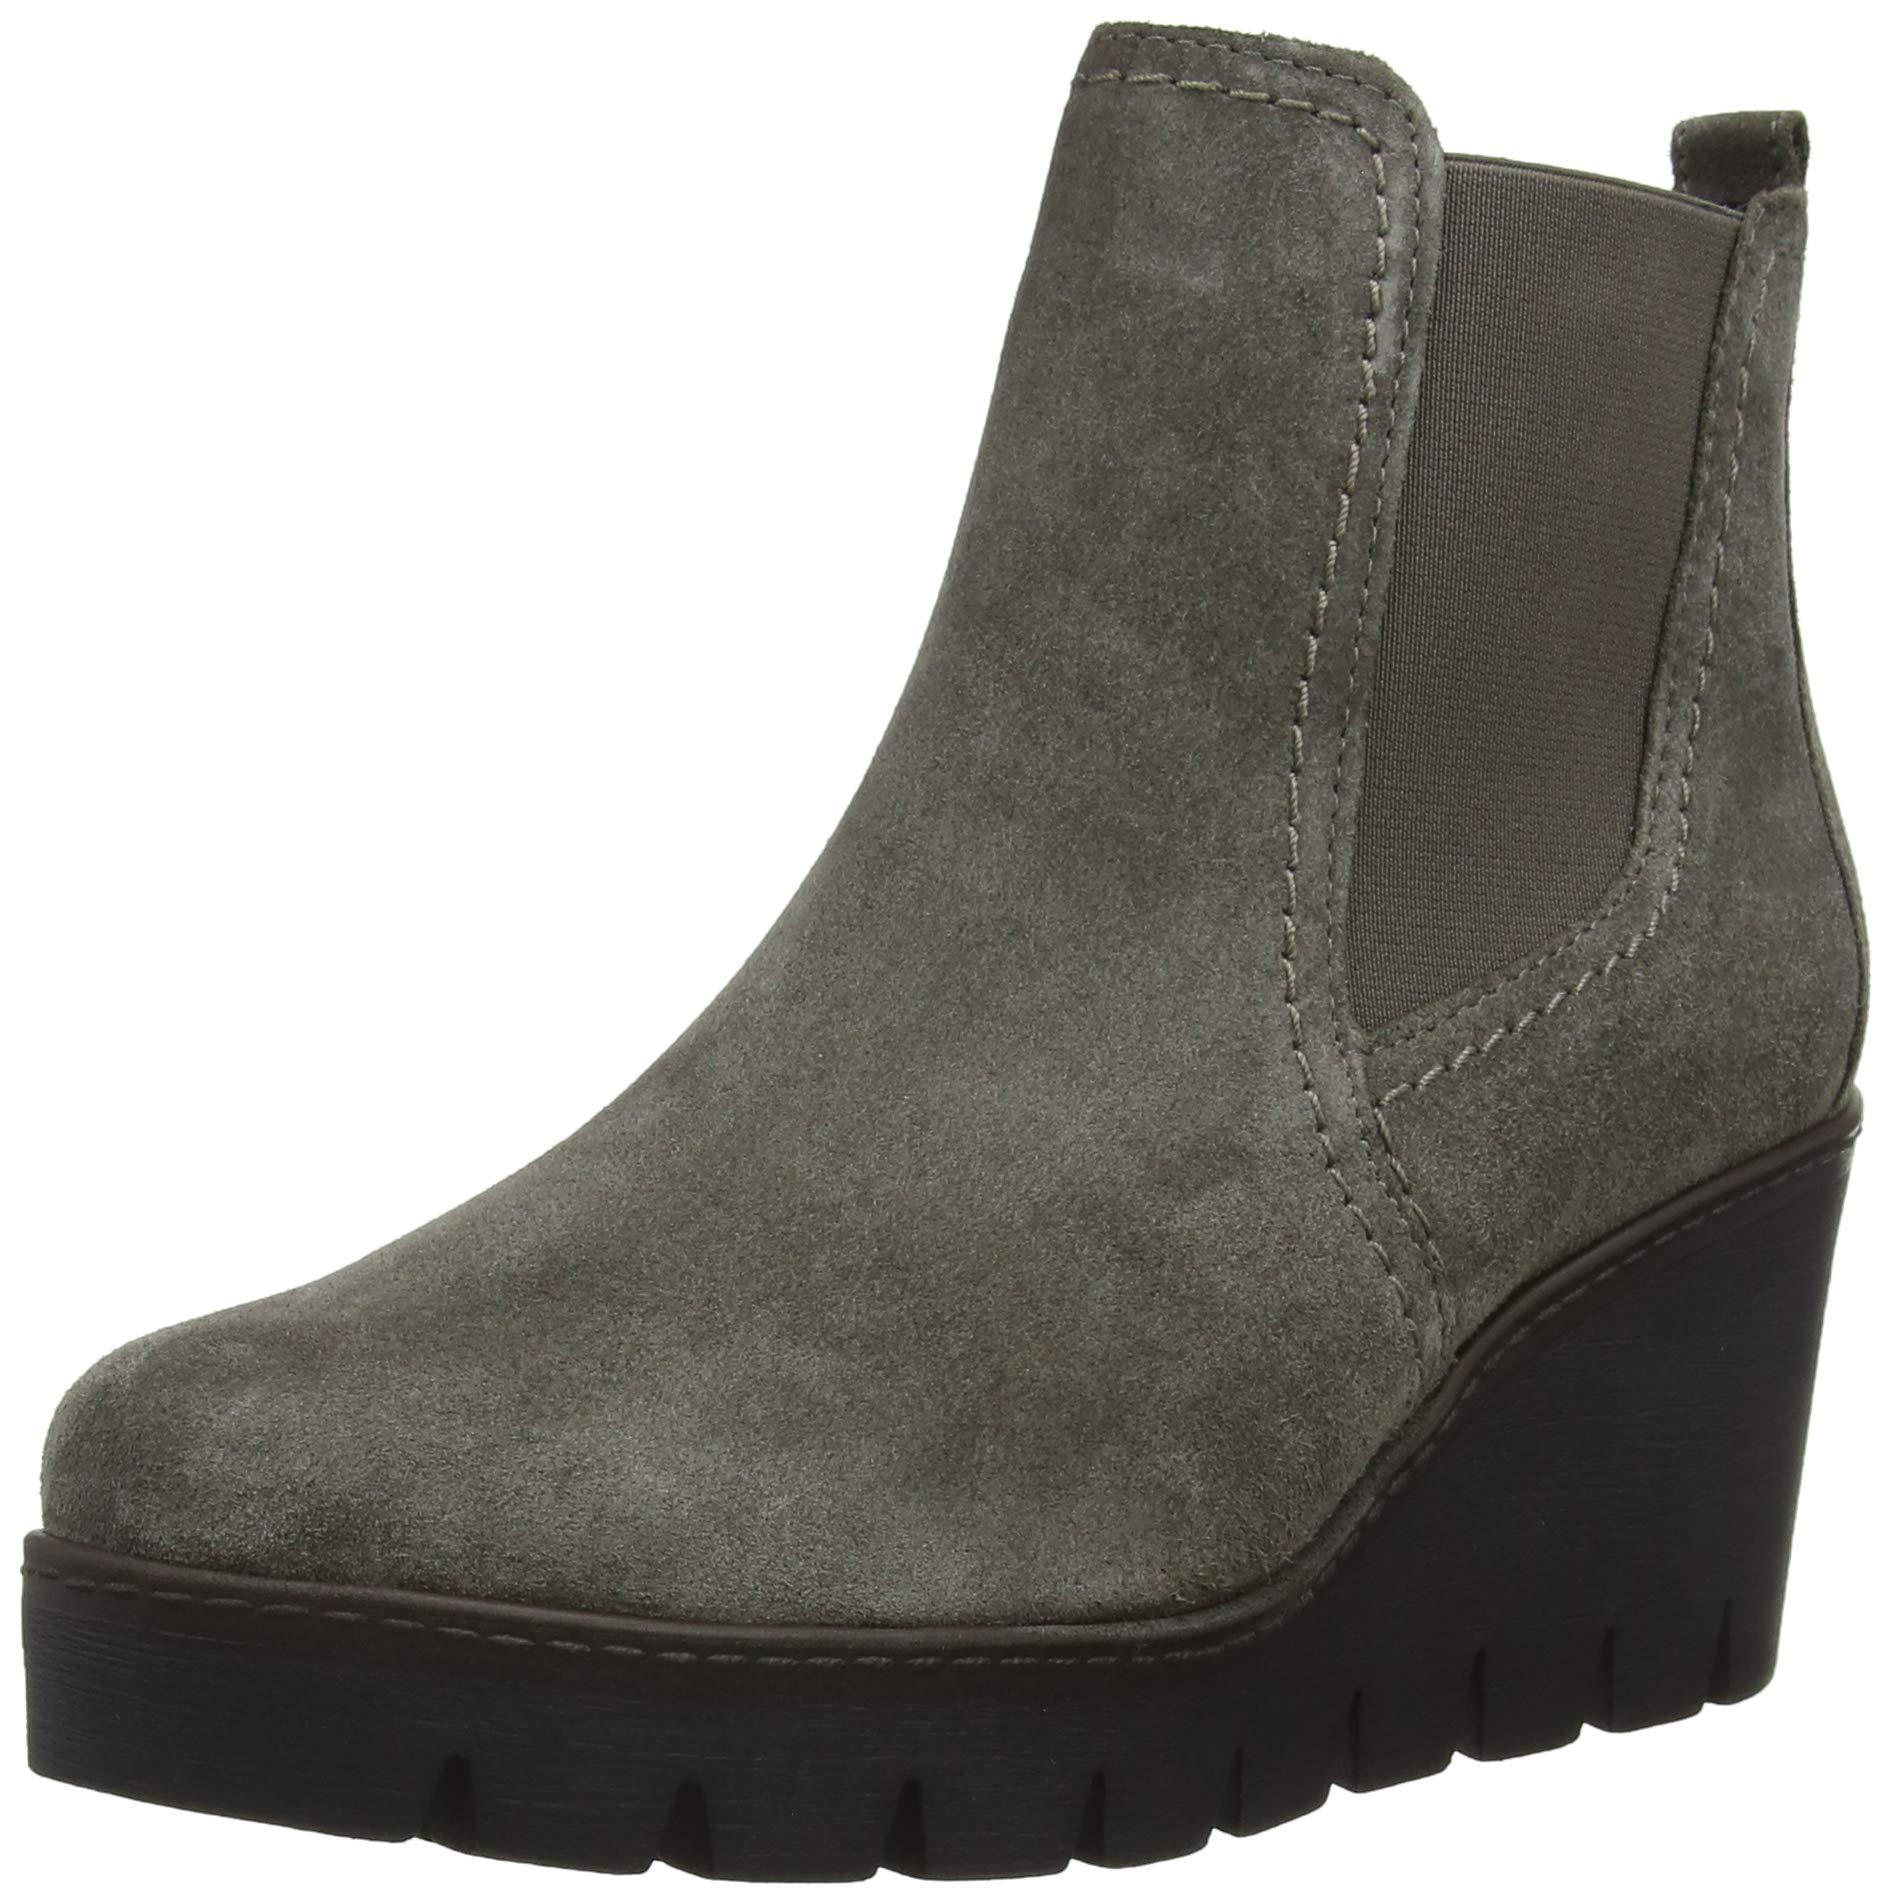 JollysBotines FemmeMarronwallabycognac1240 Eu Shoes 5 Gabor eWCQdrxBo